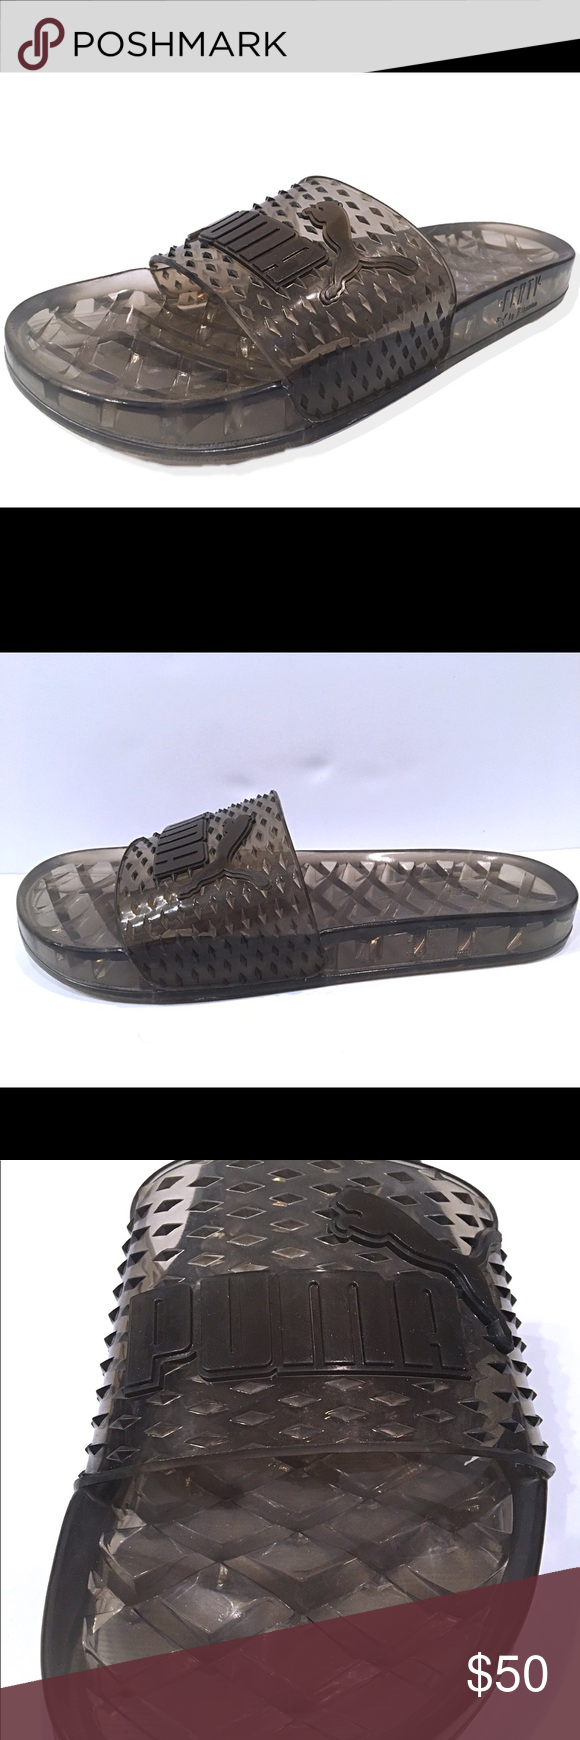 Puma X Fenty By Rihanna Black Slides Mens Sandals Puma X Fenty By Rihanna  Black Clear Jelly Slip On Slides Men s Sandals 365773-02 New without box  Puma ... ba493dfce